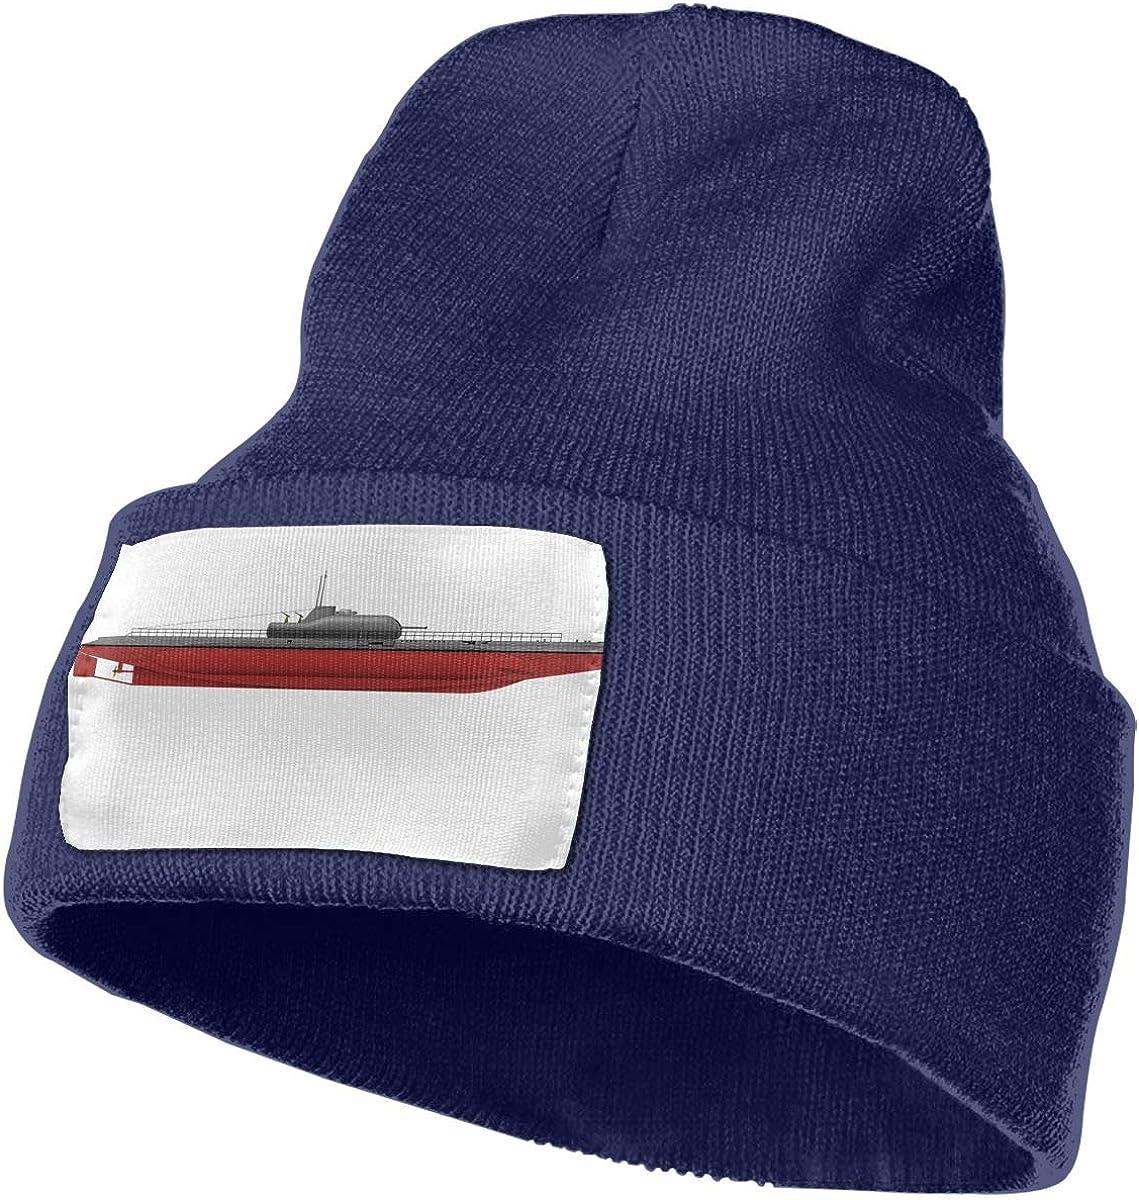 QZqDQ USA Aircraft Carrier Unisex Fashion Knitted Hat Luxury Hip-Hop Cap